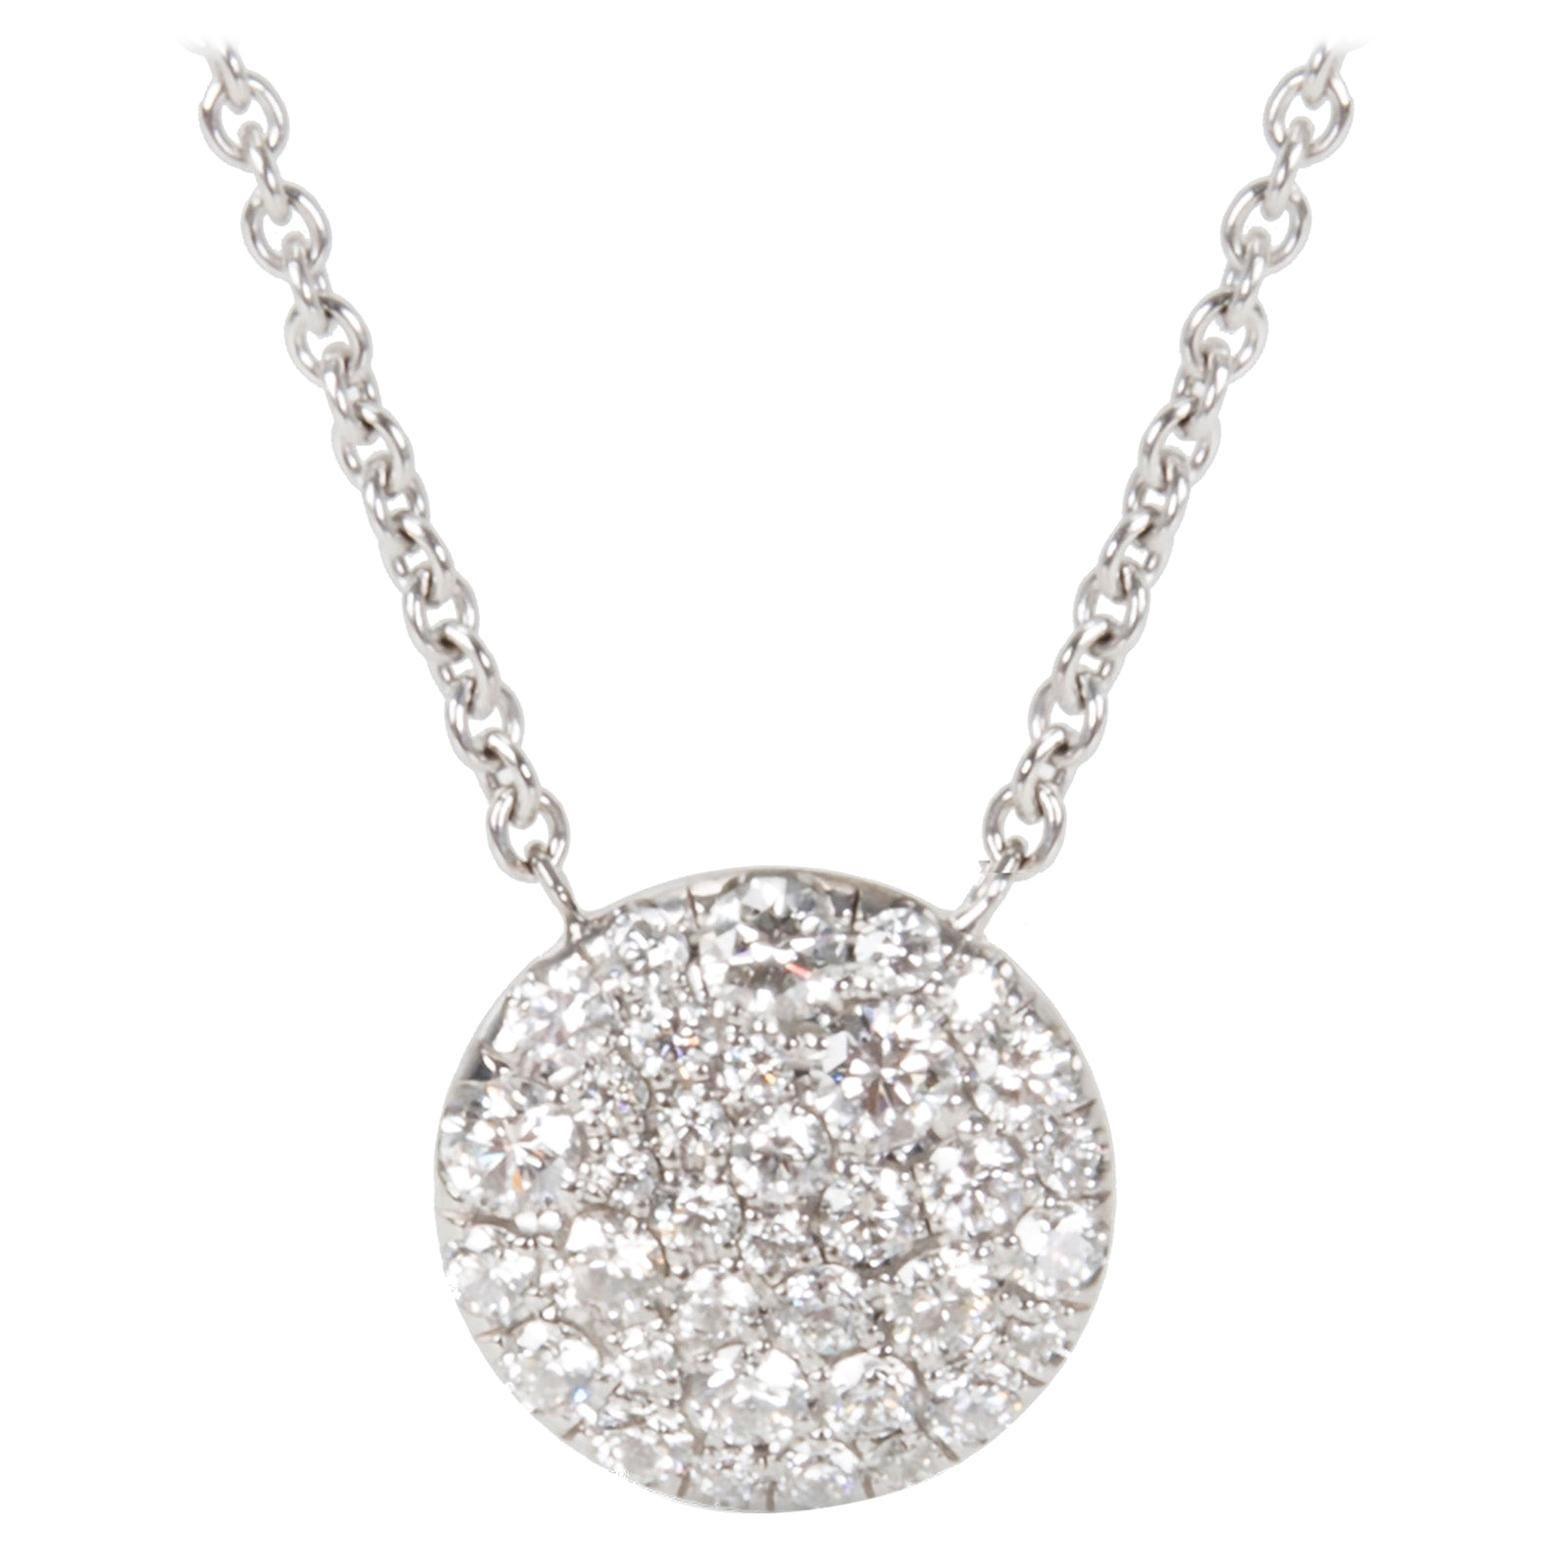 Tiffany & Co. Round Diamond Pendant in 18 Karat White Gold '0.29 CTW'